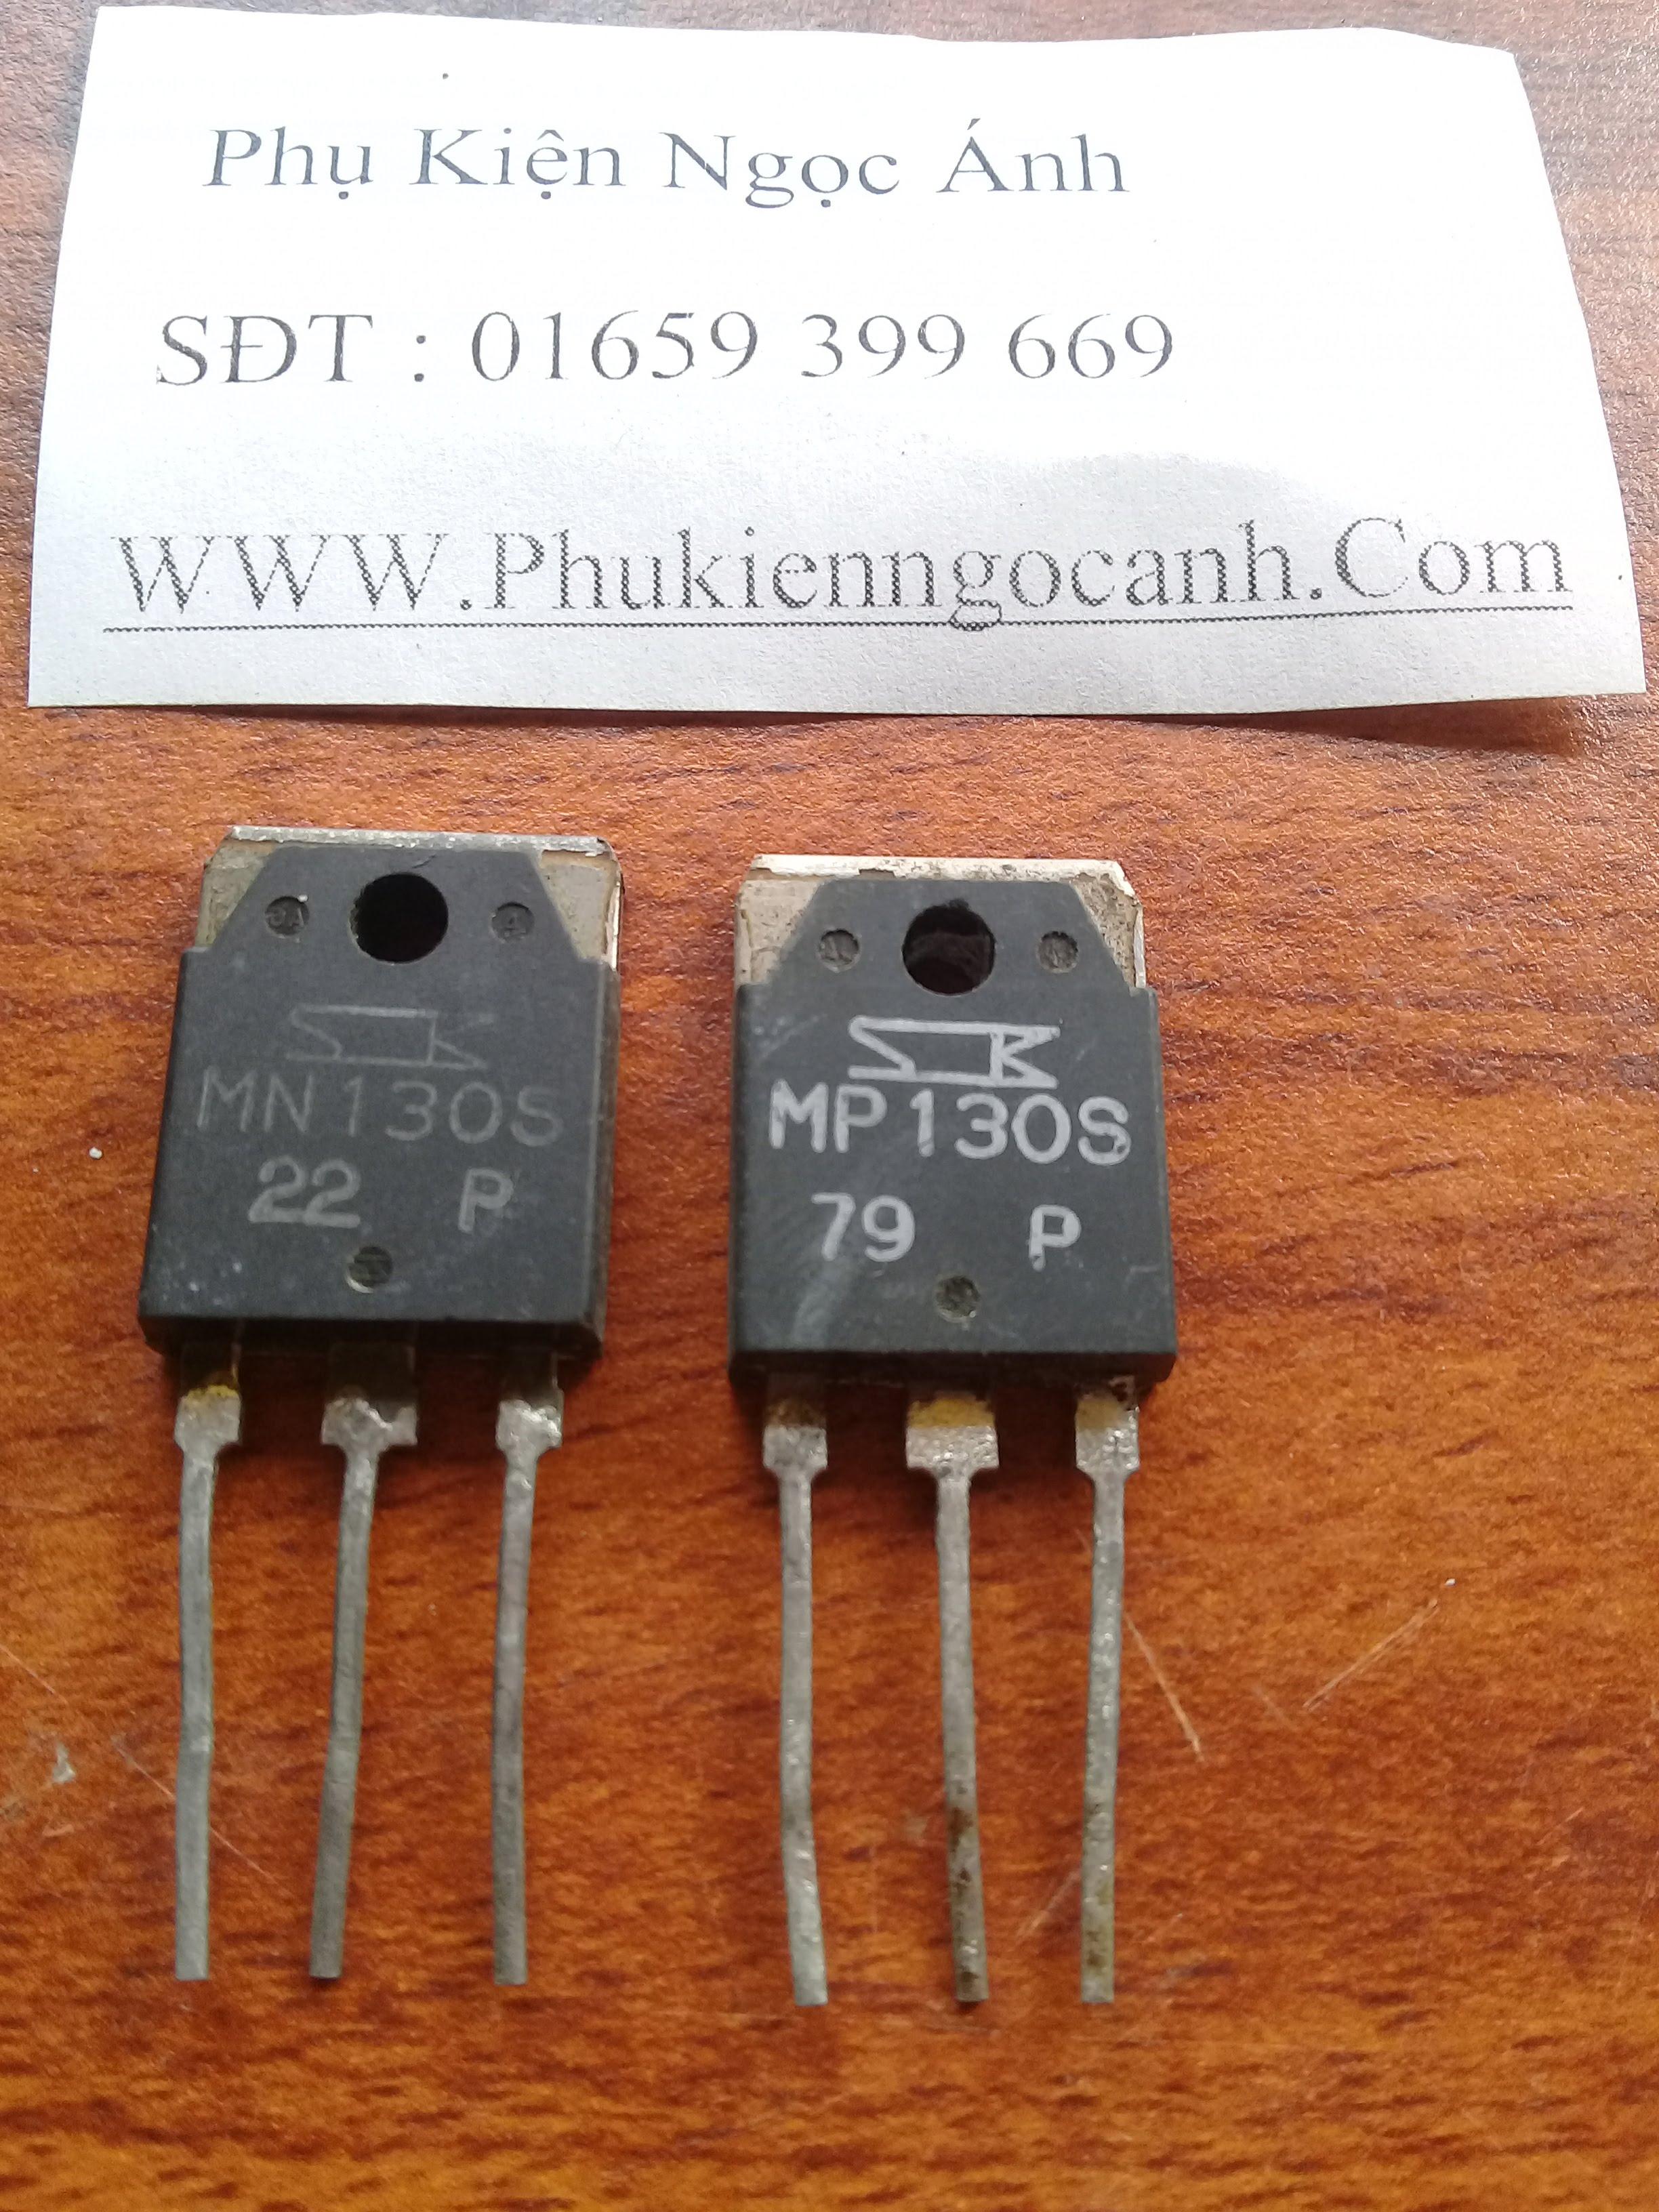 MN130S MP130S cặp saken nhỏ bóc máy chất lượng cao 56k/cặp